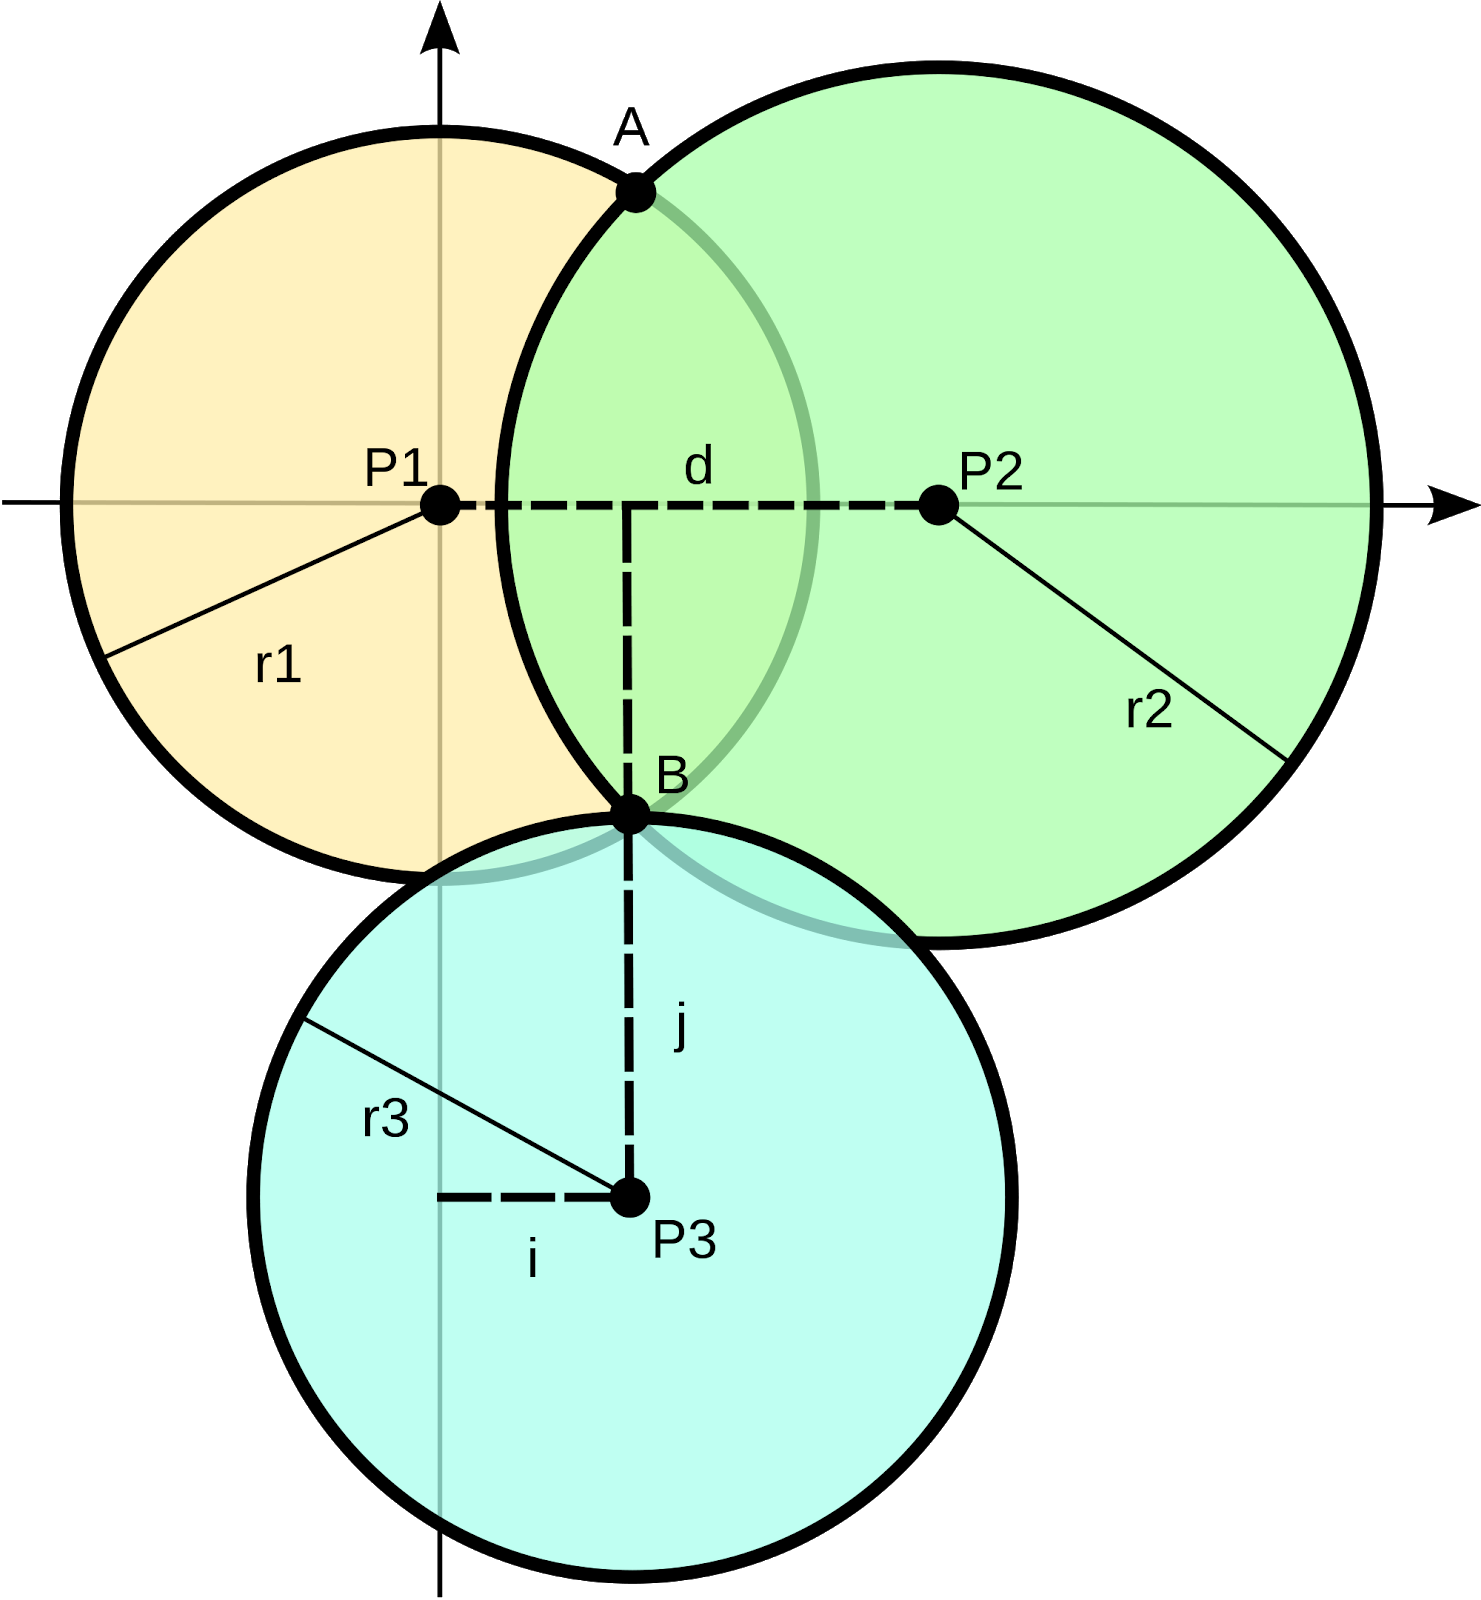 Figure 3. Trilateration